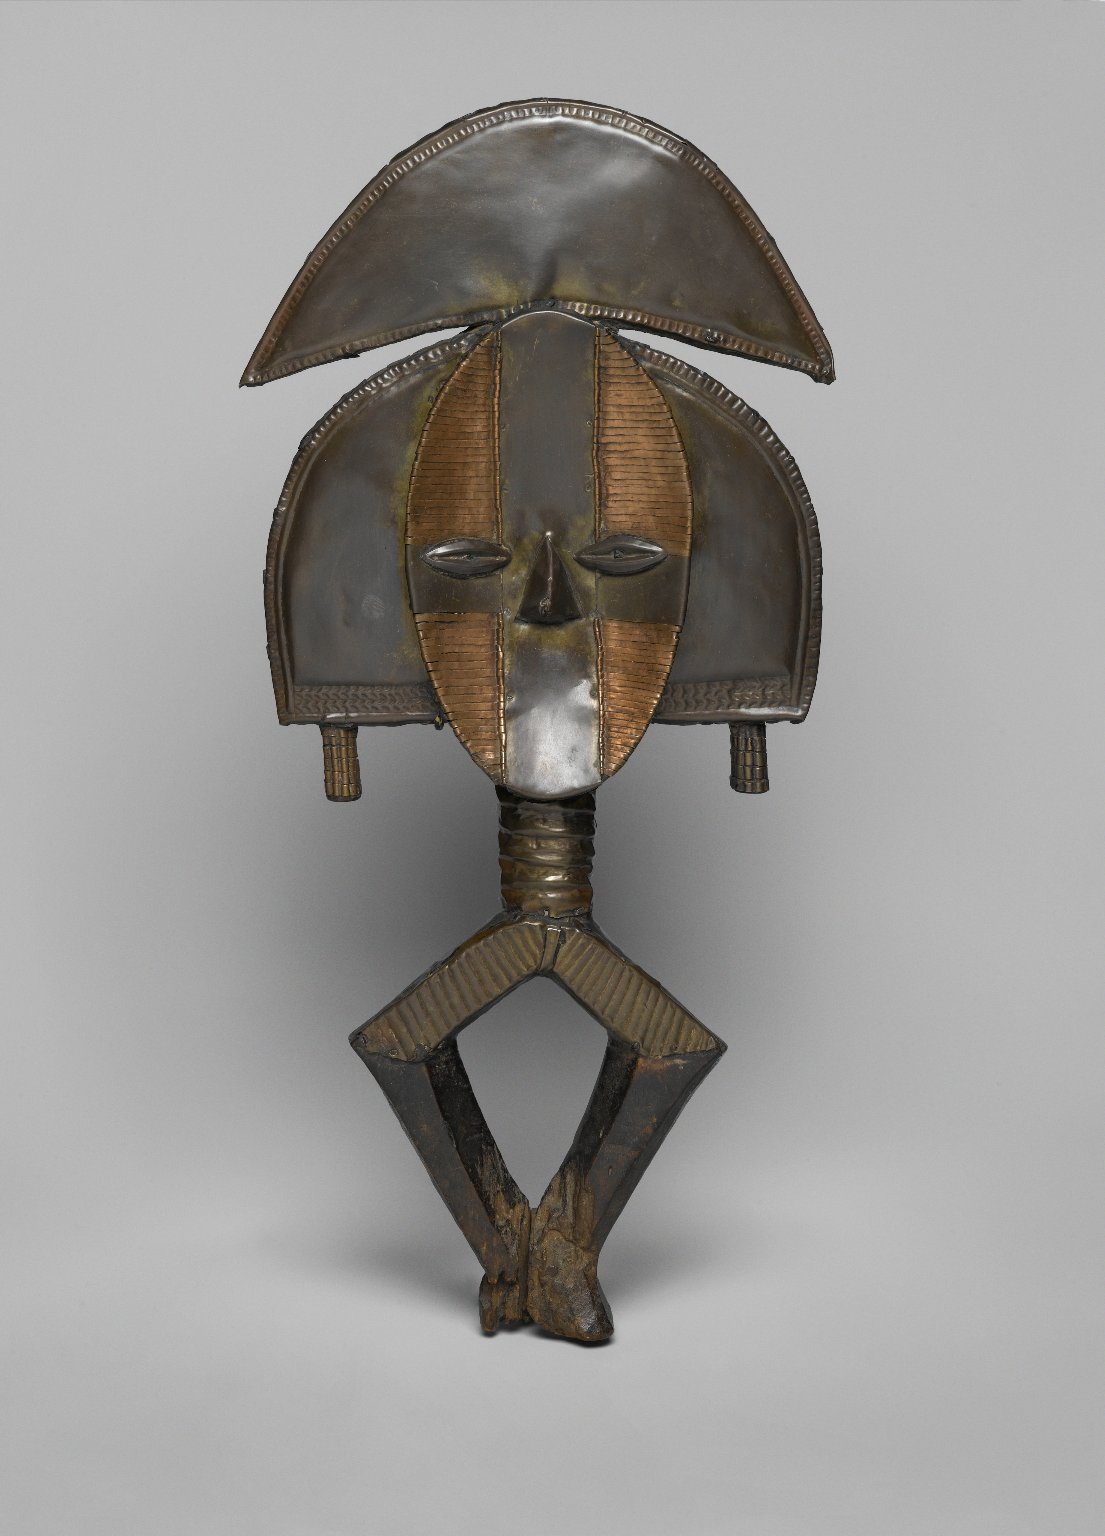 Brooklyn_Museum_1989.51.2_Reliquary_Guardian_Figure_Mbulu_Ngulu.jpg